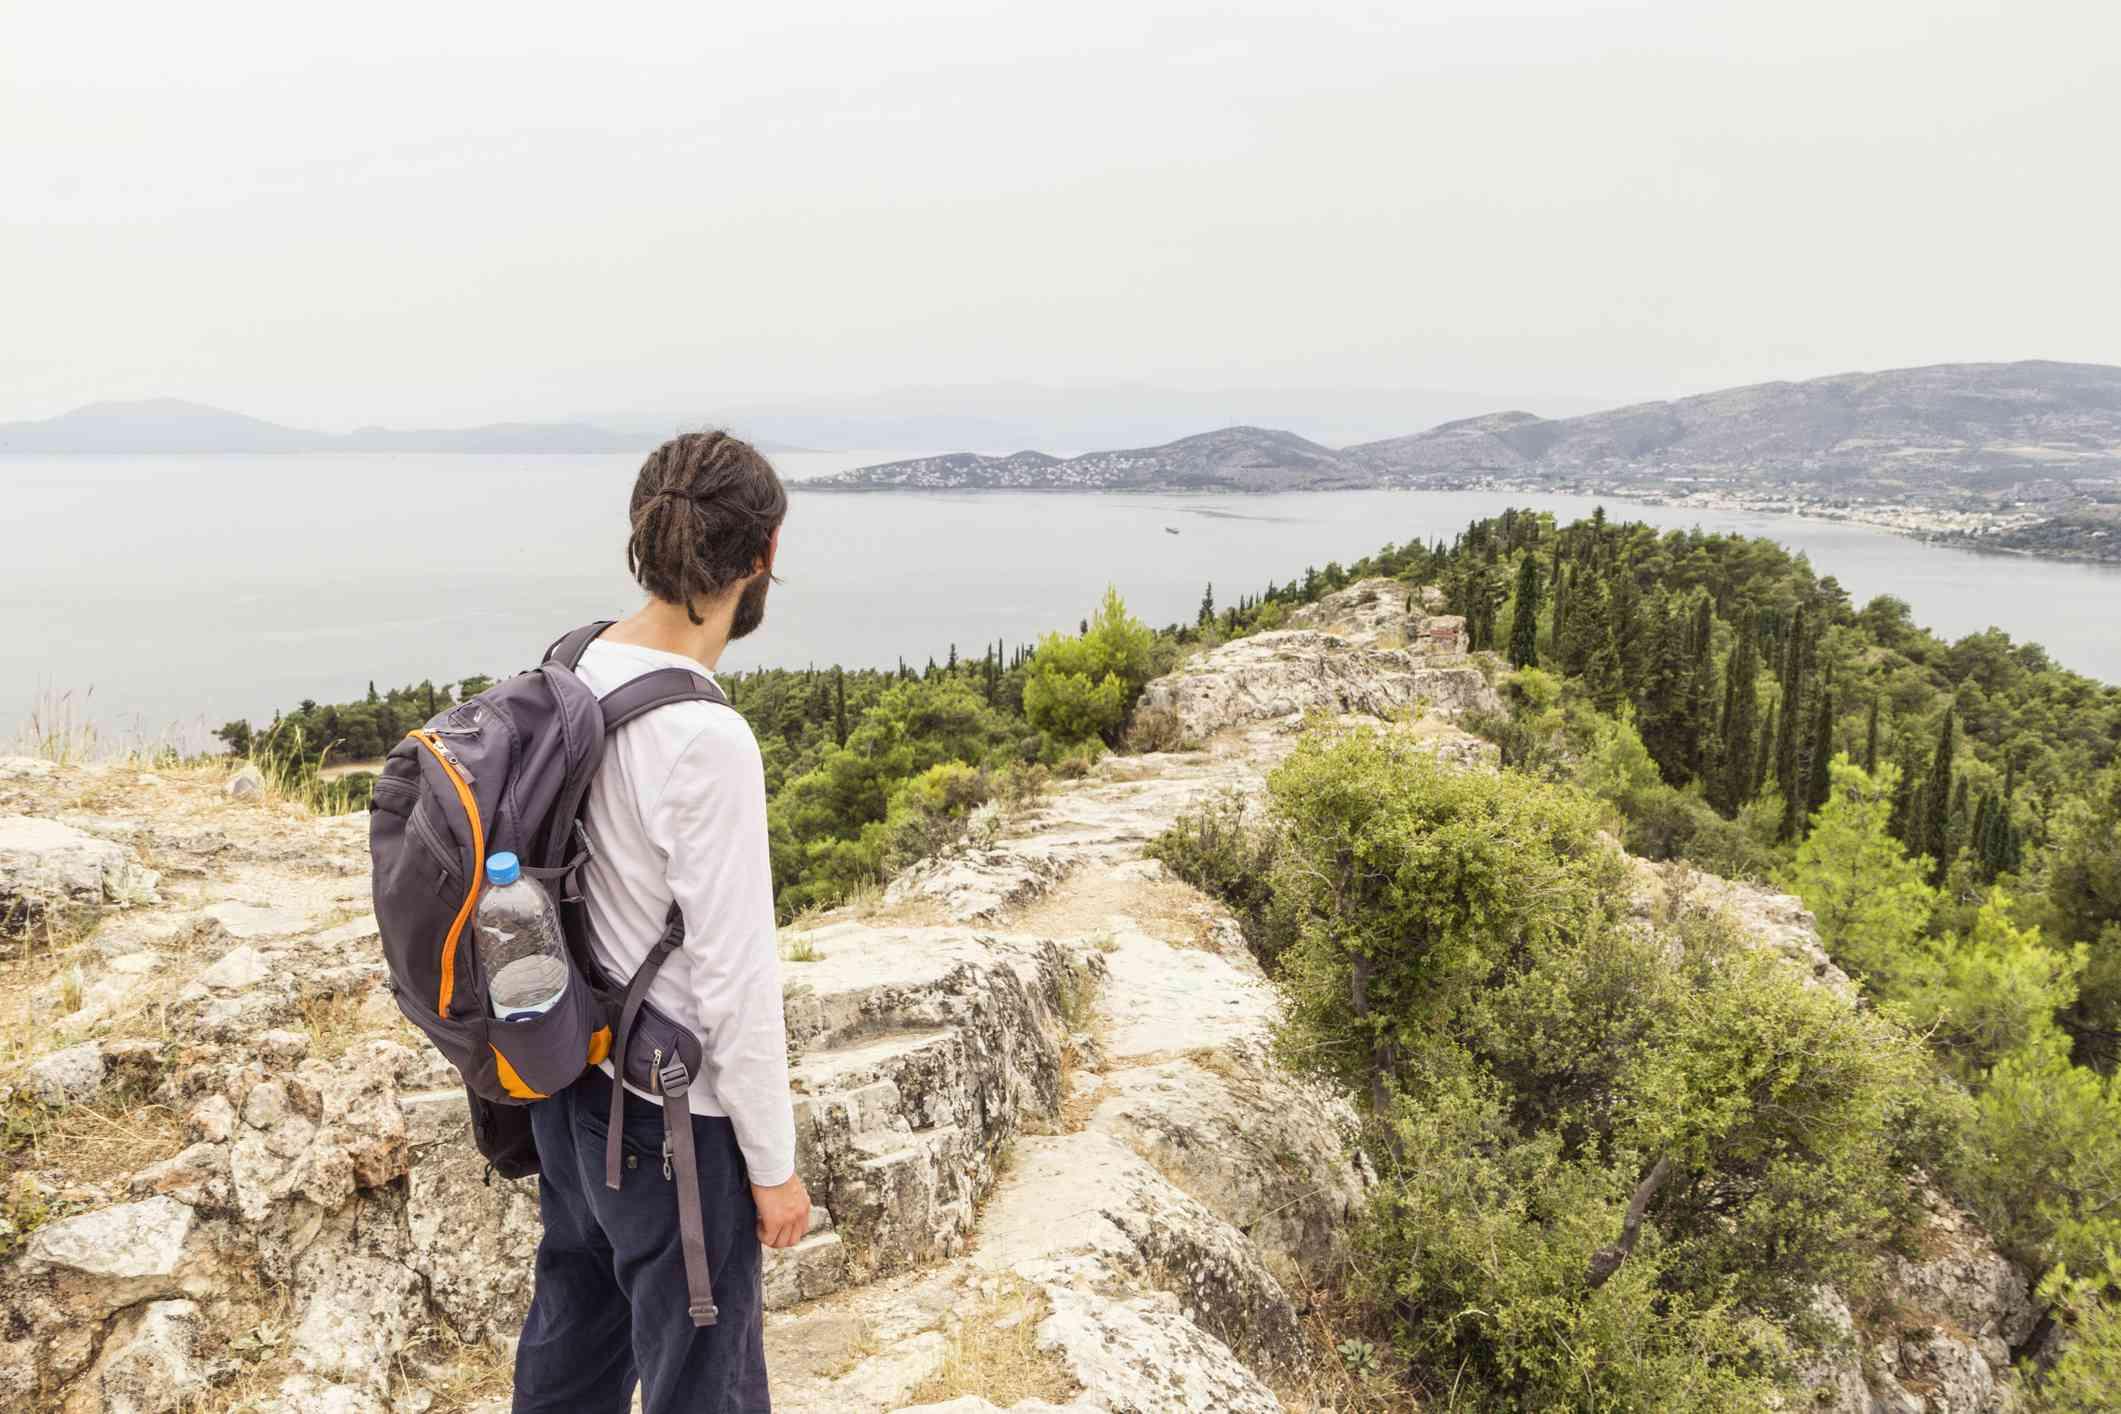 Greece, Volos, man enjoying view to Pagasetic Gulf